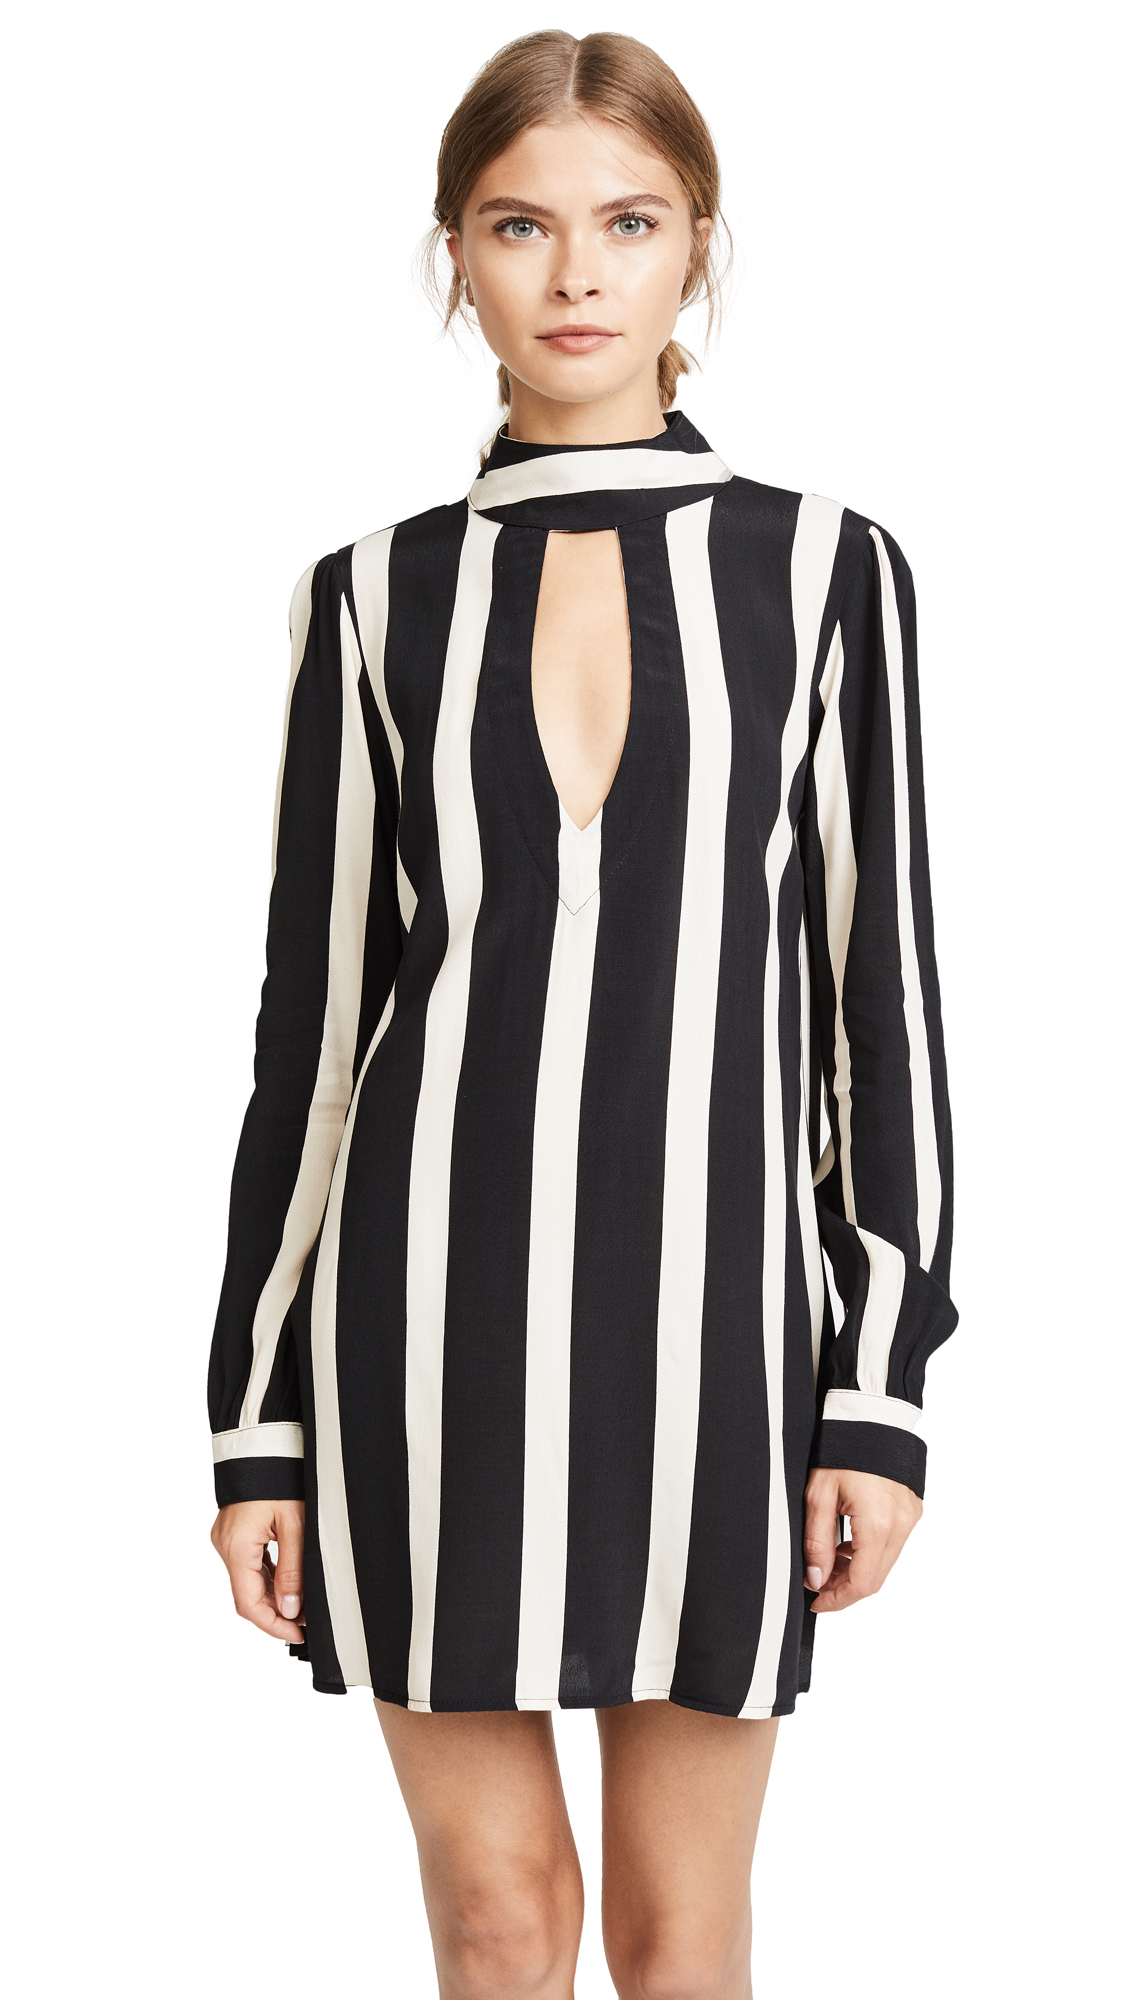 Flynn Skye Leah Mini Dress - Bold Stripe